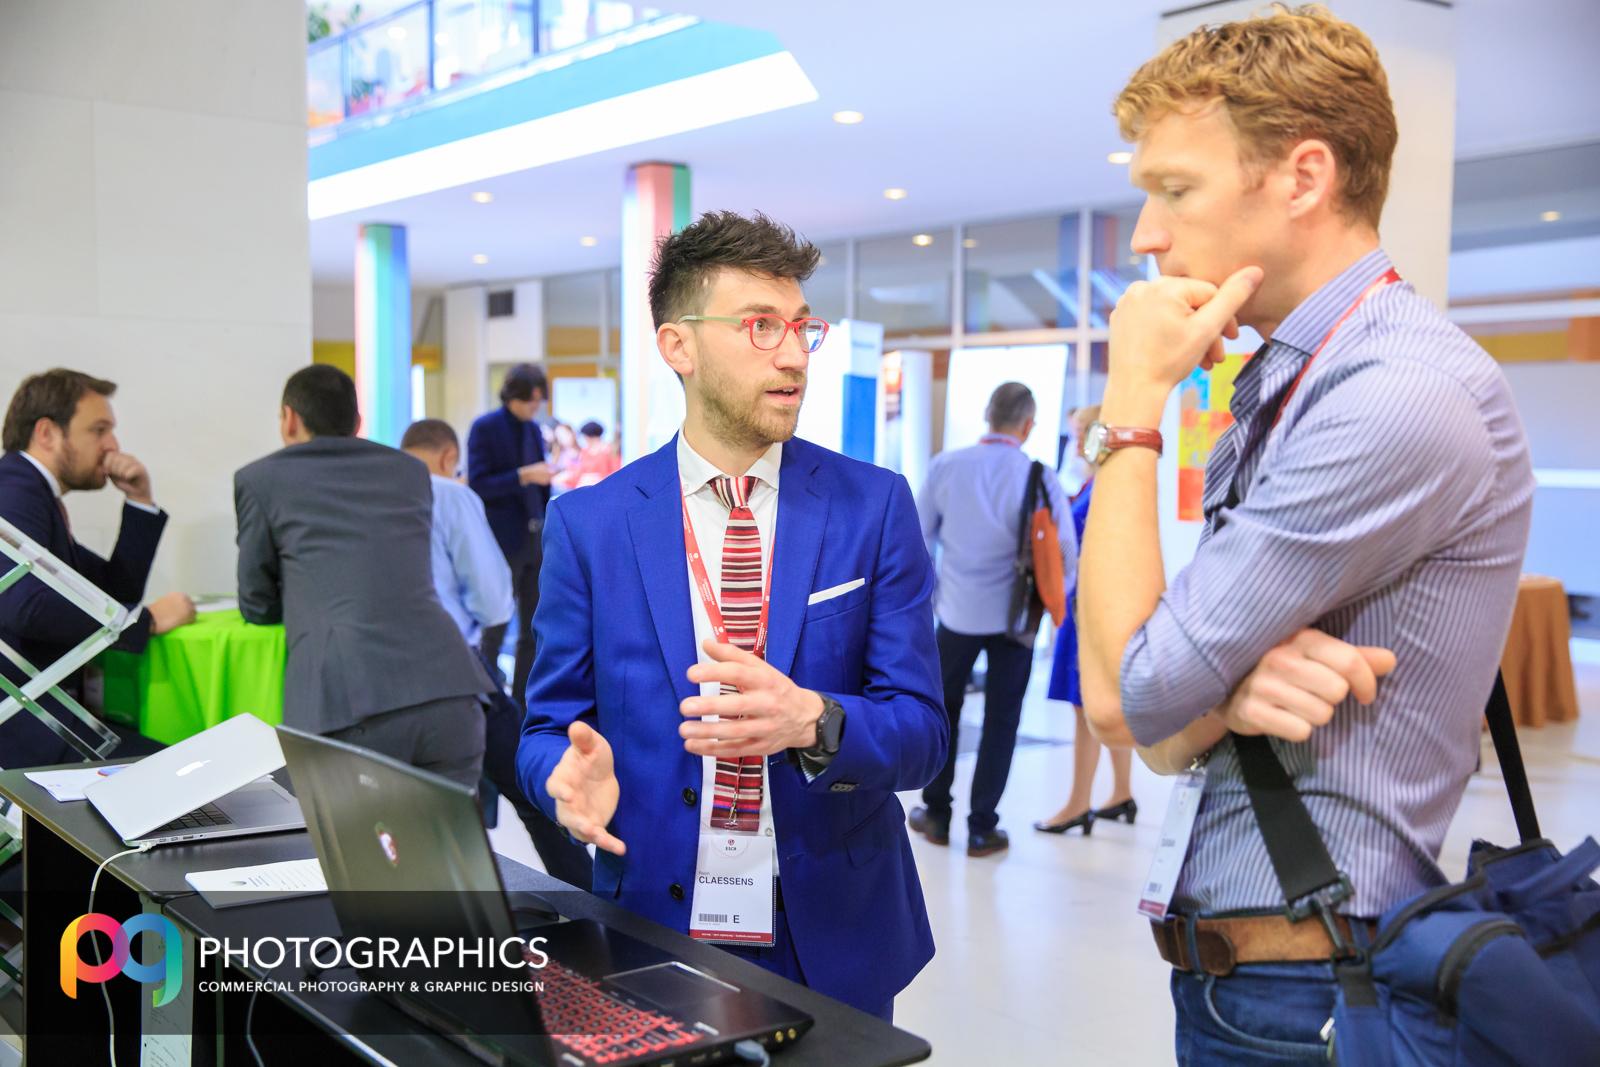 ESCR-2018-conference-event-photography-UK-glasgow-edinburgh-13.jpg